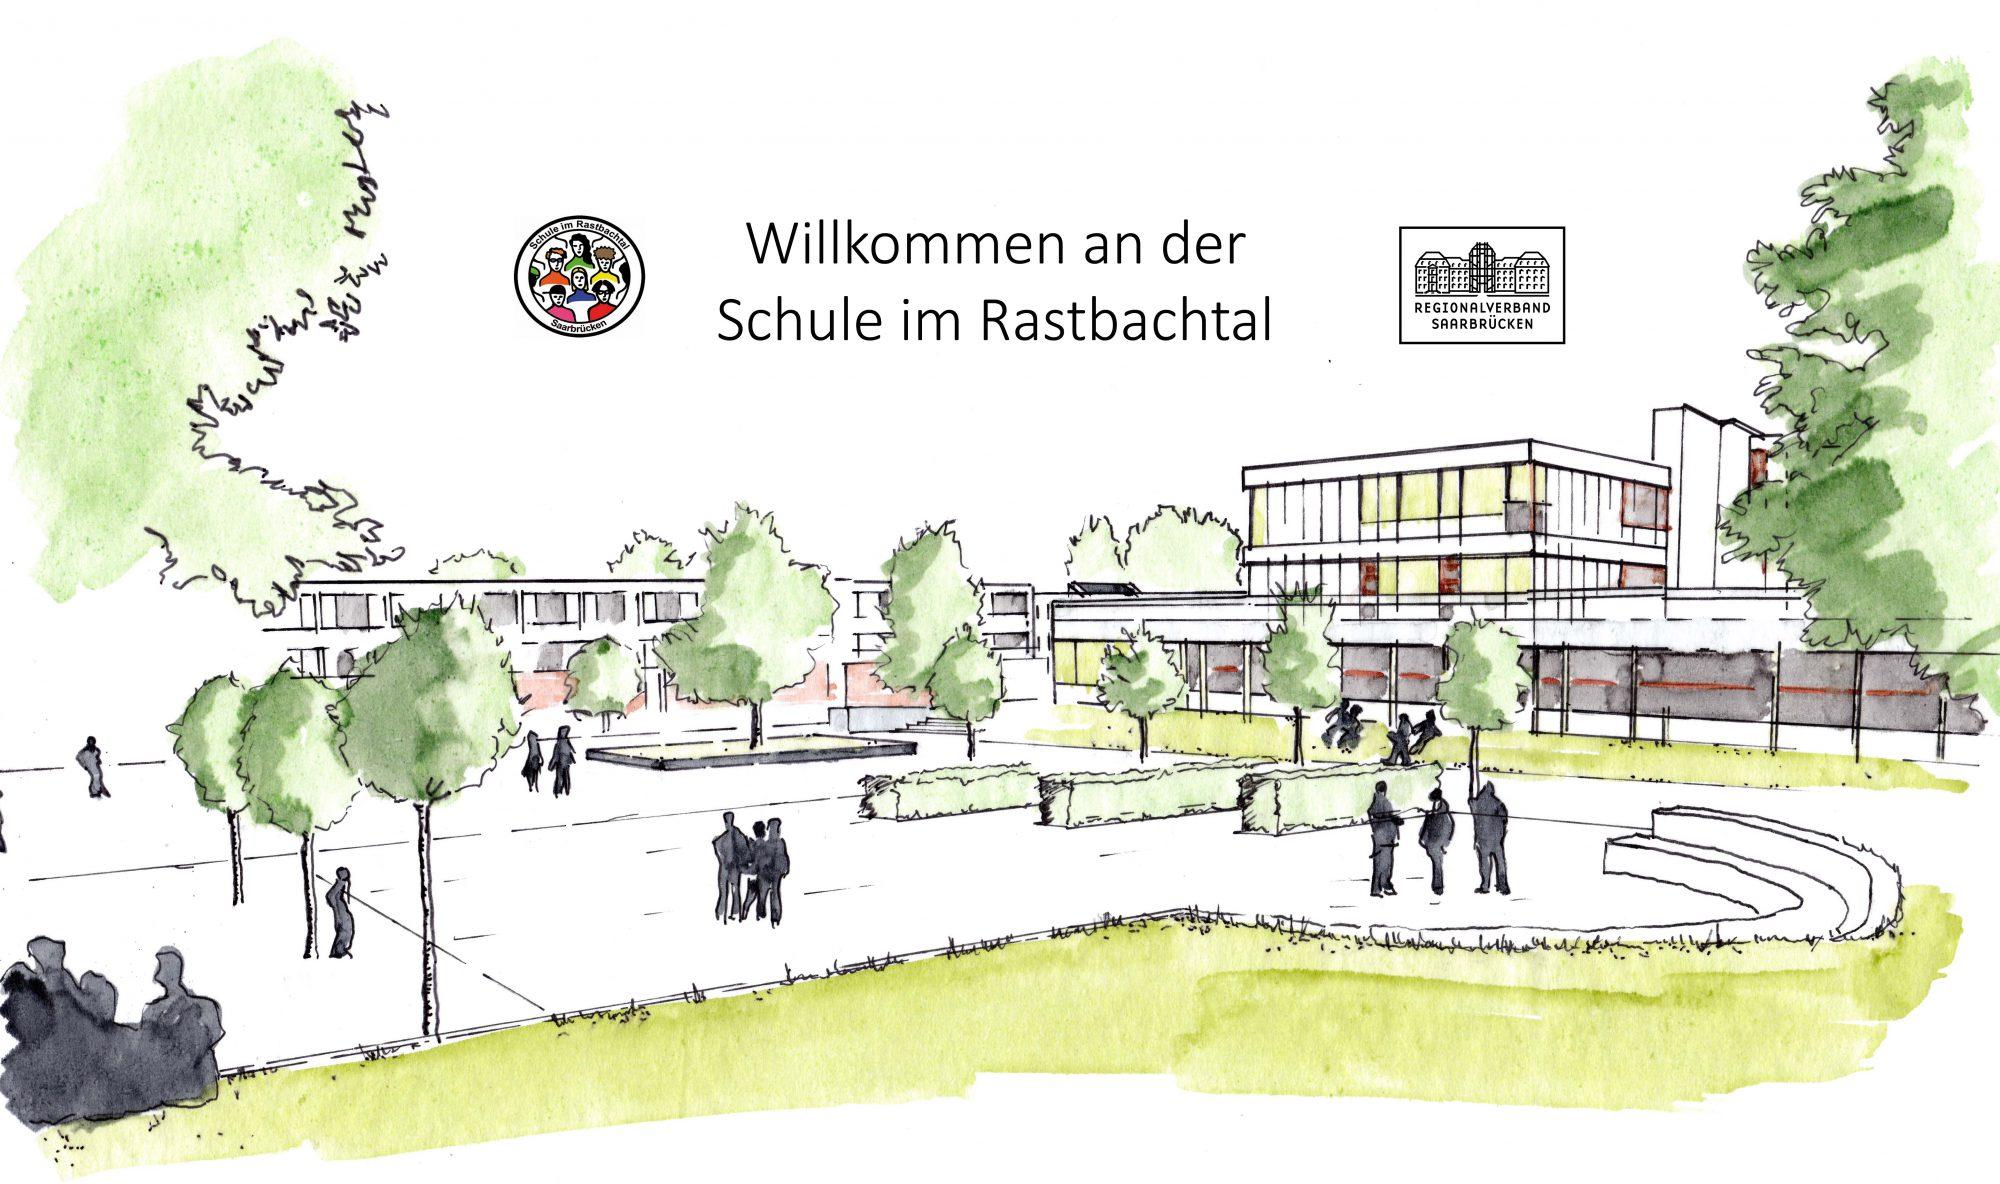 Schule im Rastbachtal